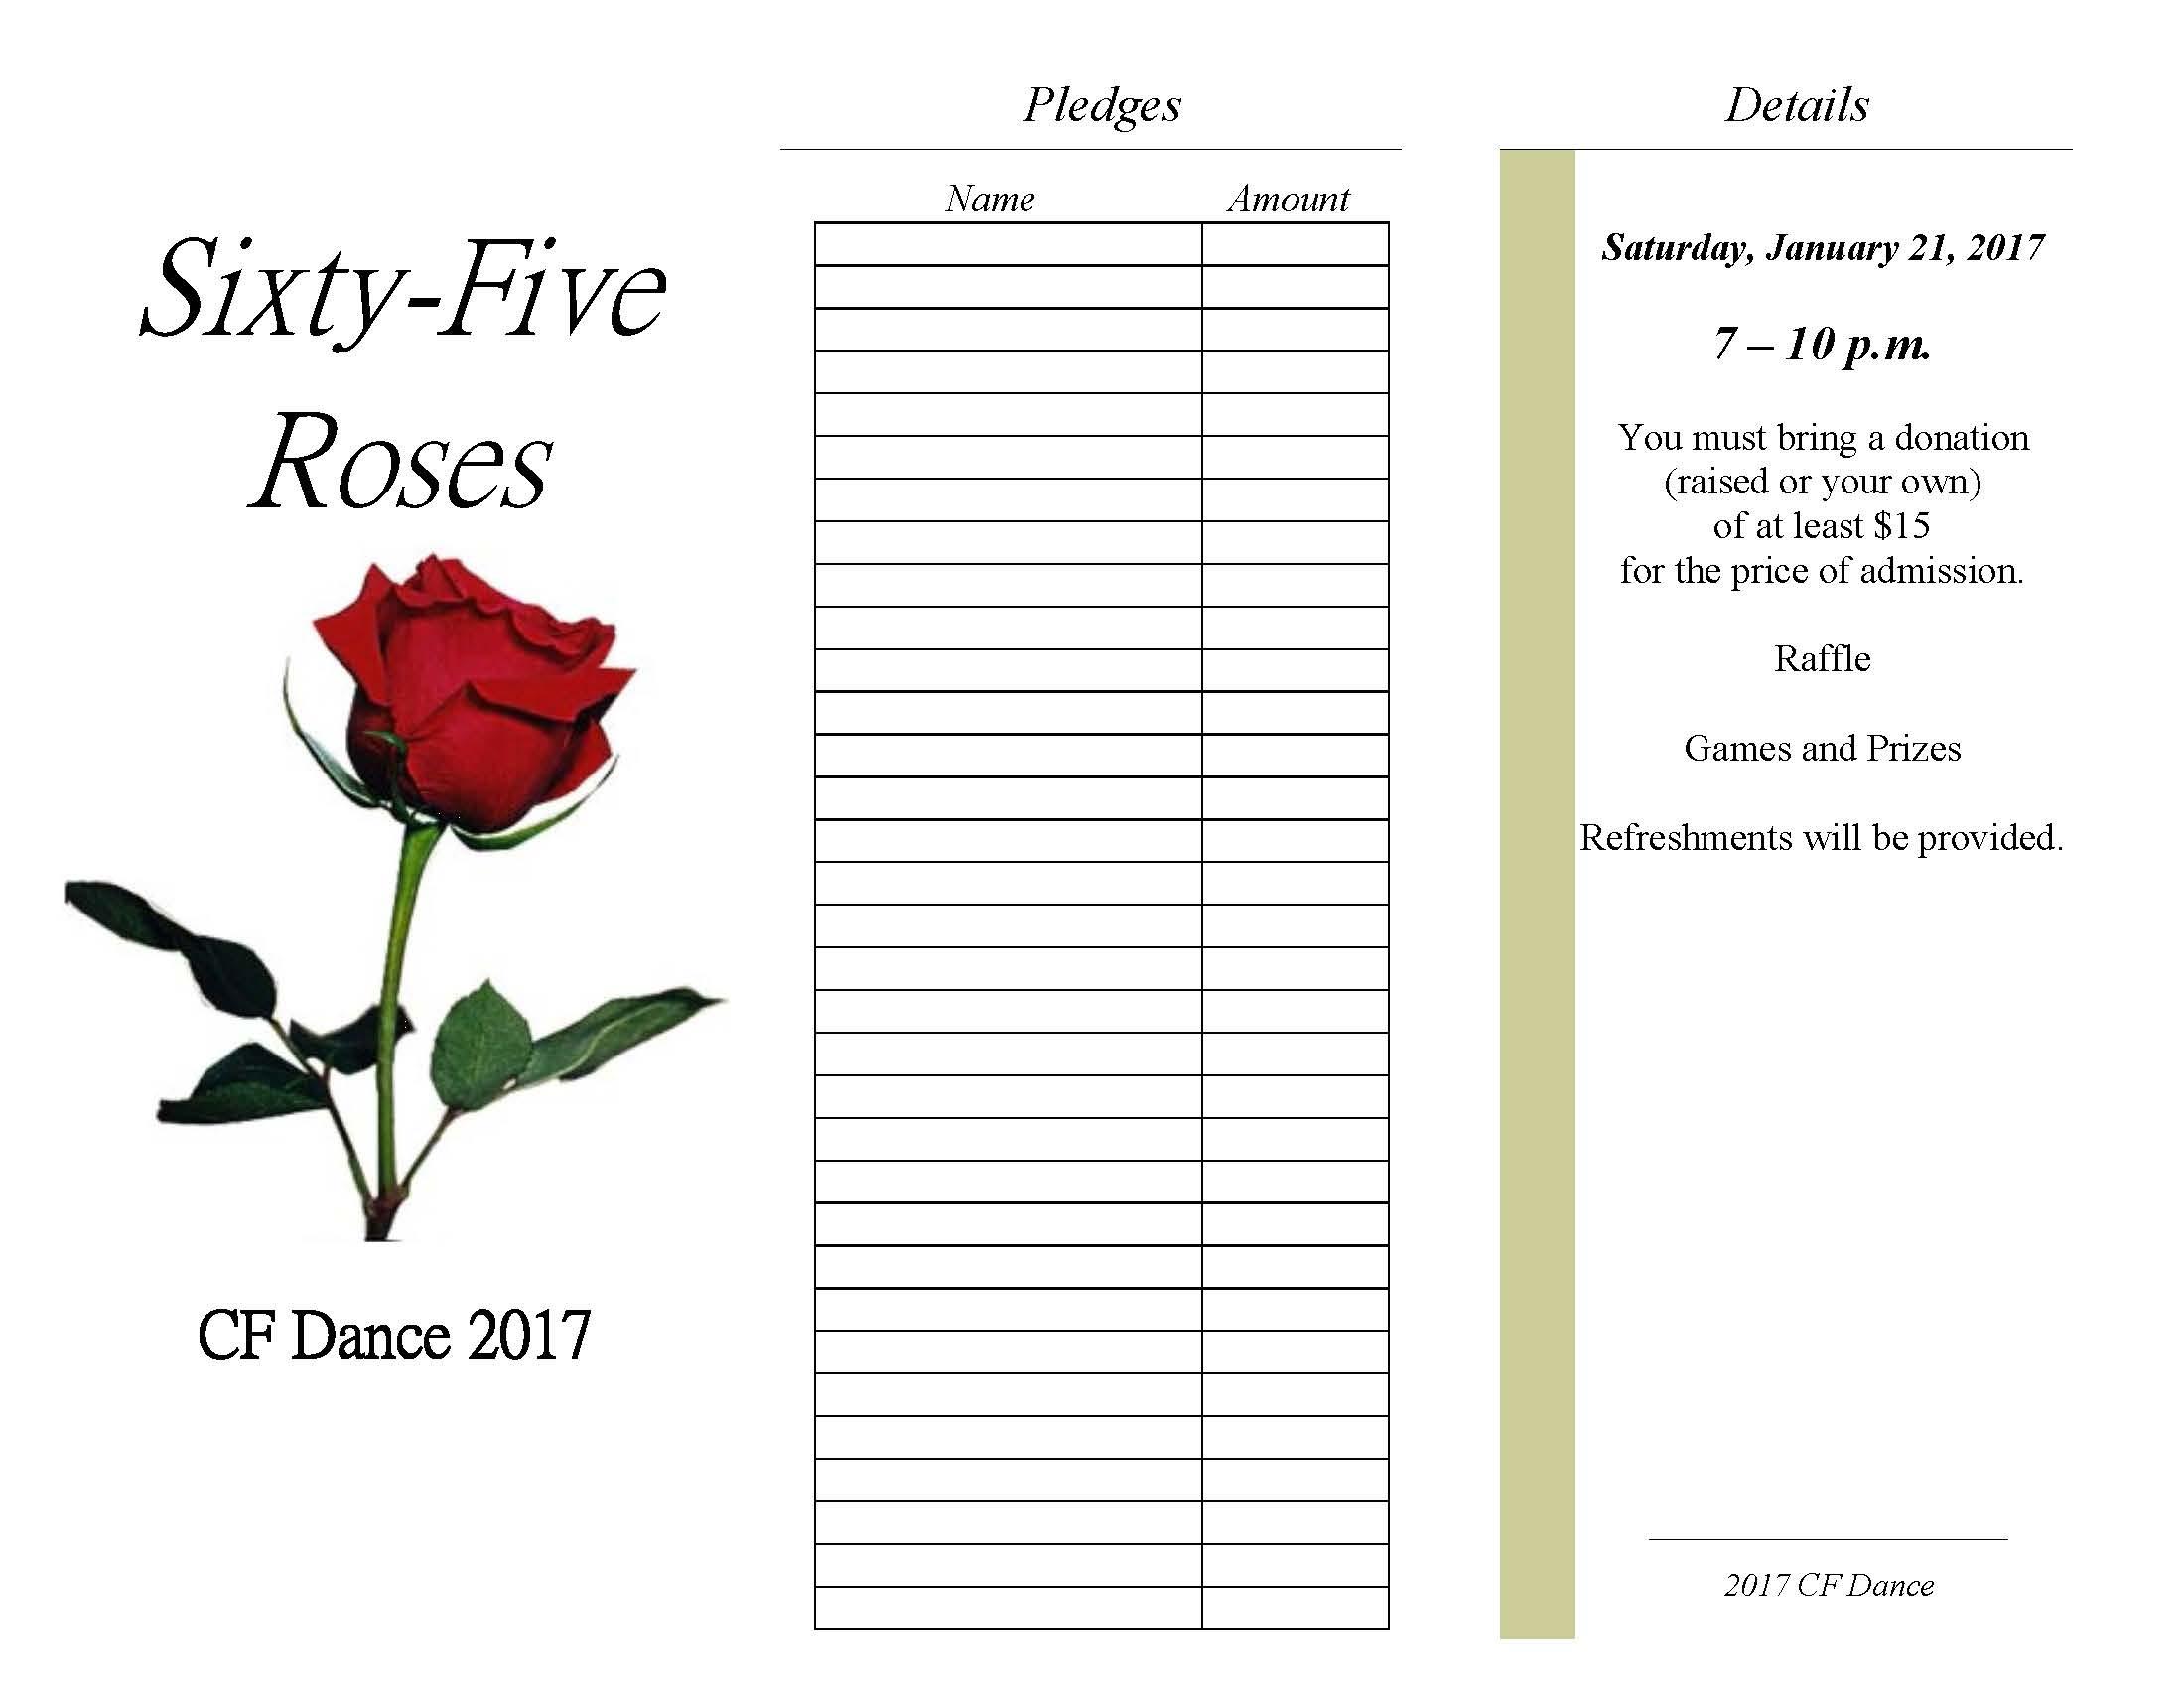 Cf Dance Pledge Form